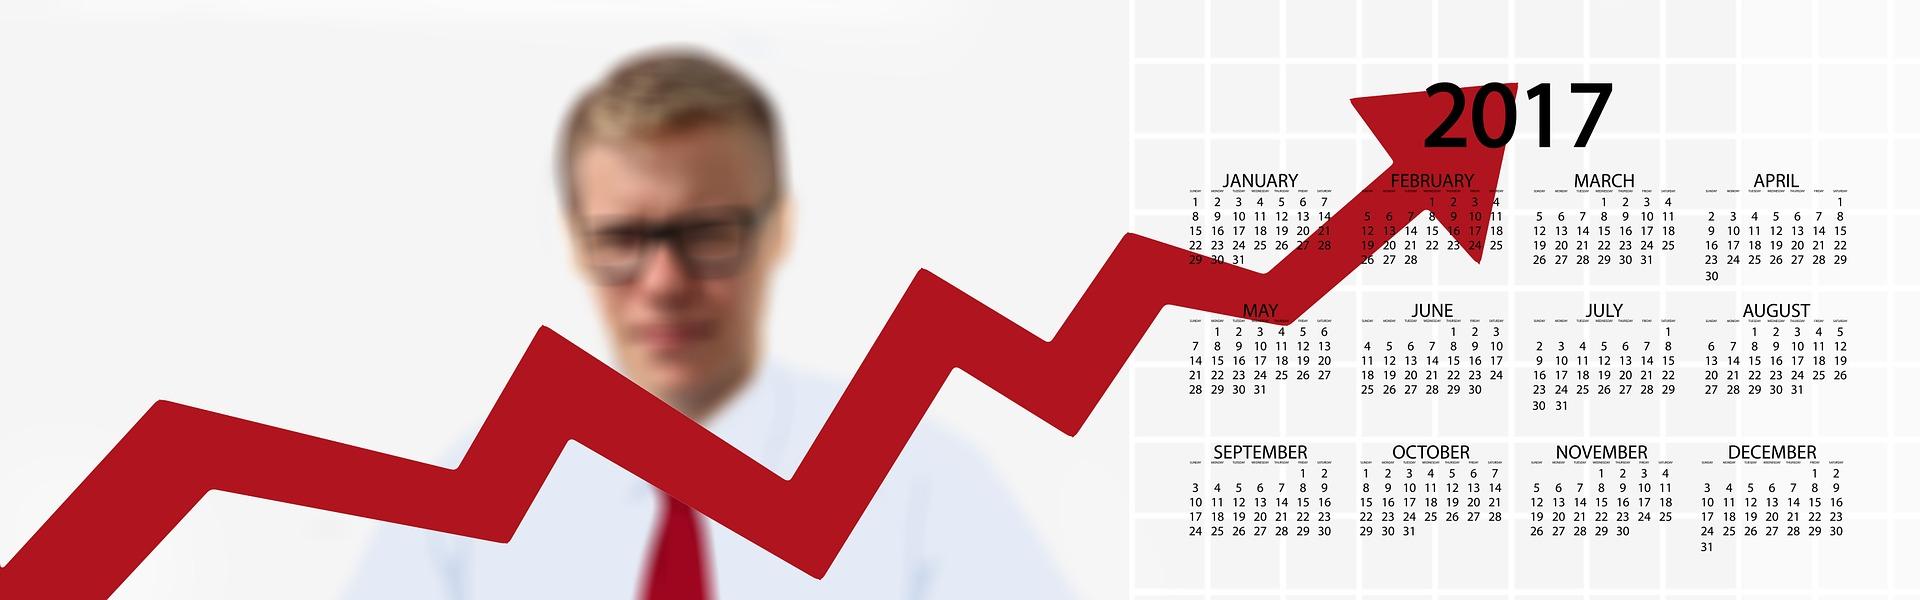 inventory replenishment, restocking, forecasting solutions - Valogix!